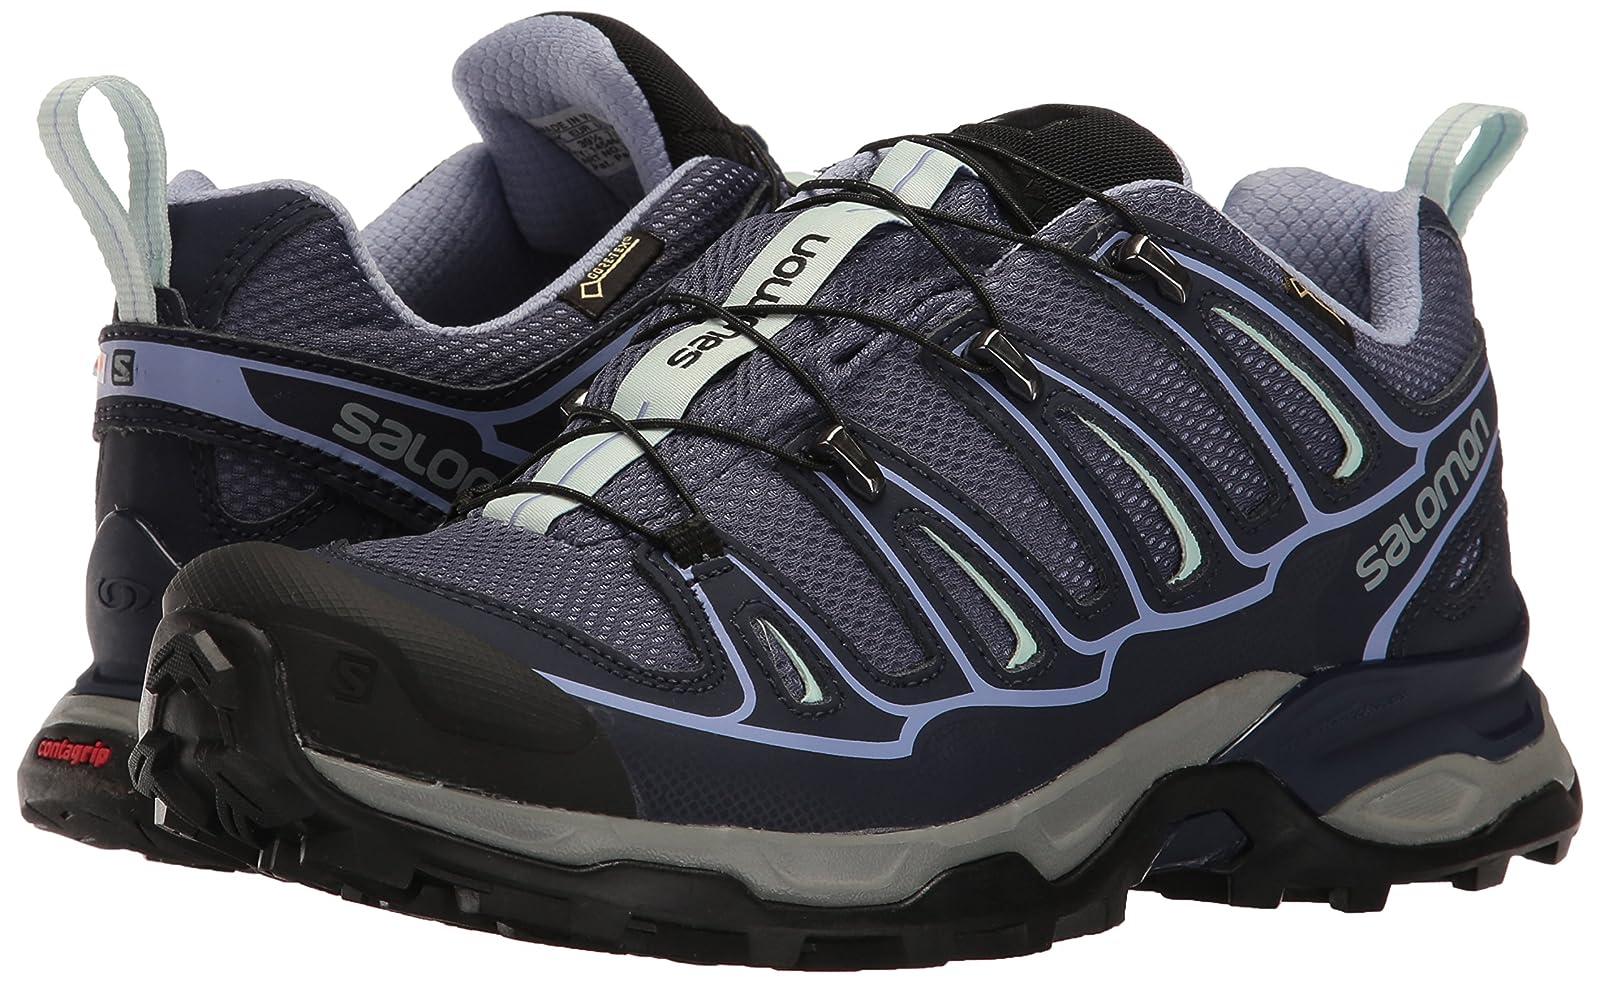 Salomon Women's X Ultra 2 GTX W Hiking Shoe 7 M US - 6